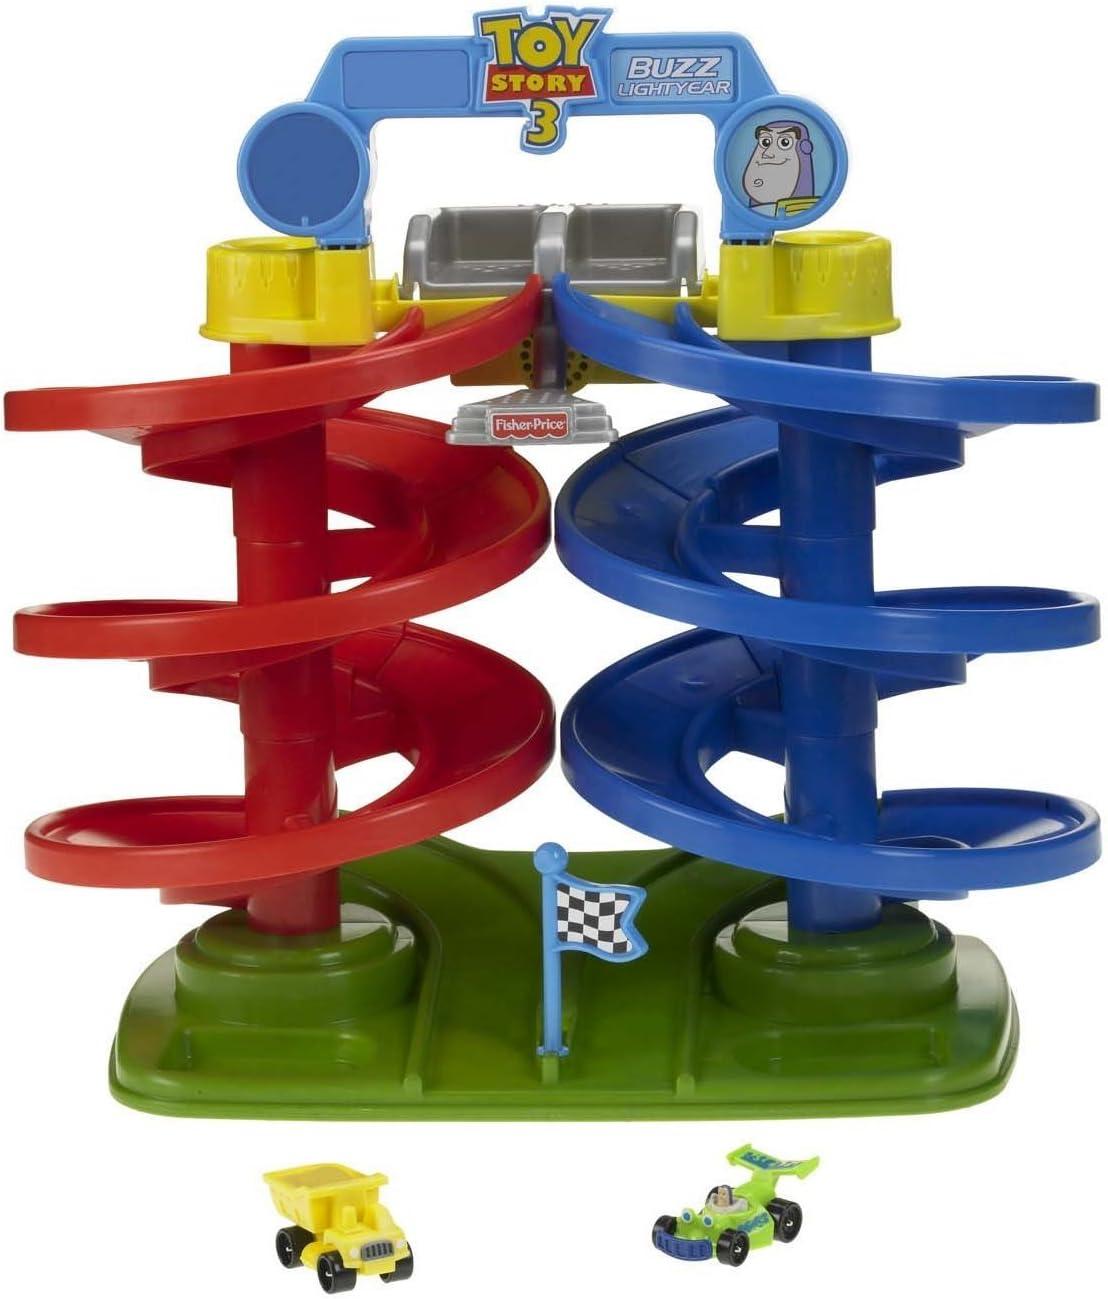 Amazon Com Fisher Price Disney Pixar Toy Story 3 Big Spiral Speedway Toys Games